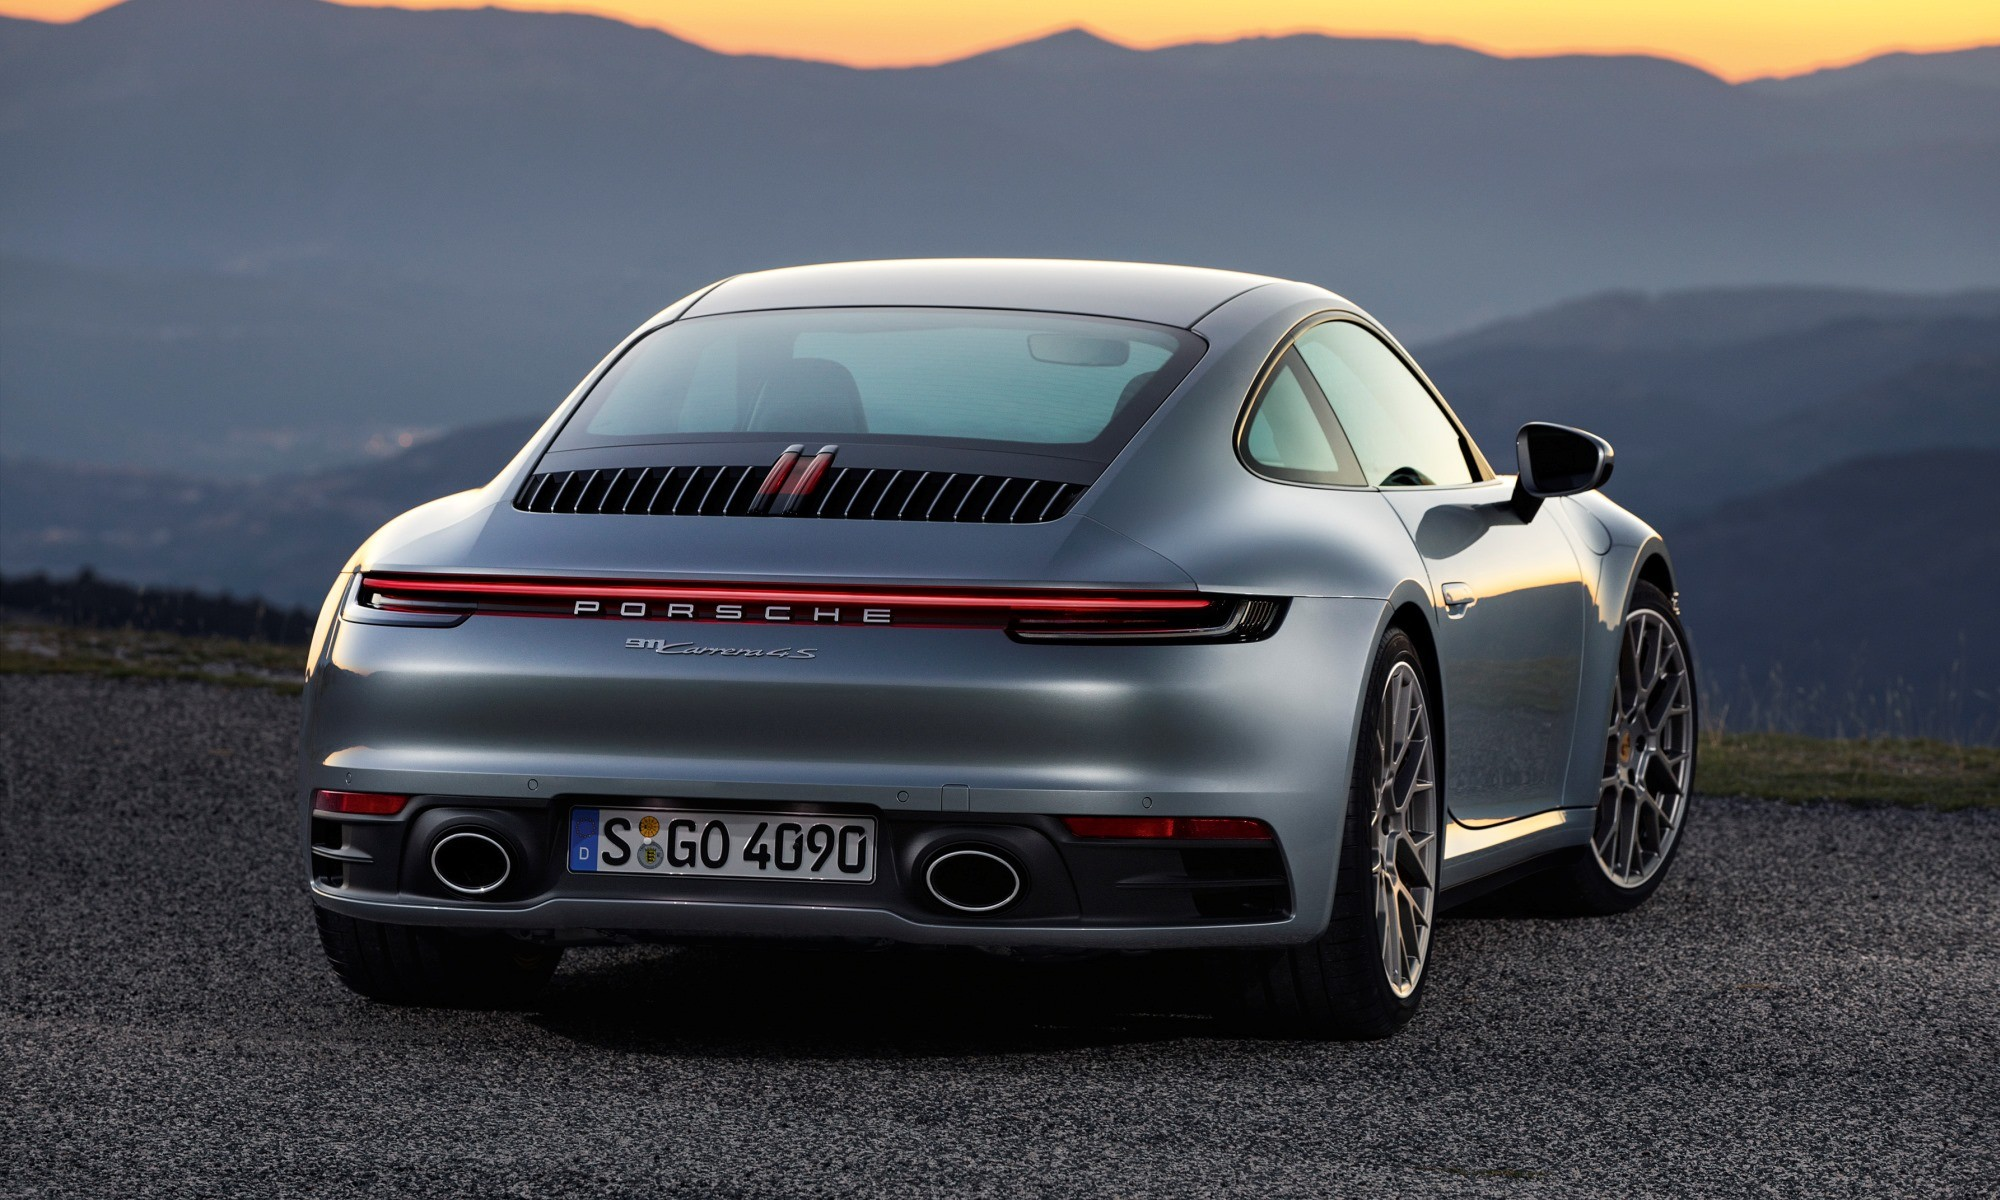 New Porsche 911 rear